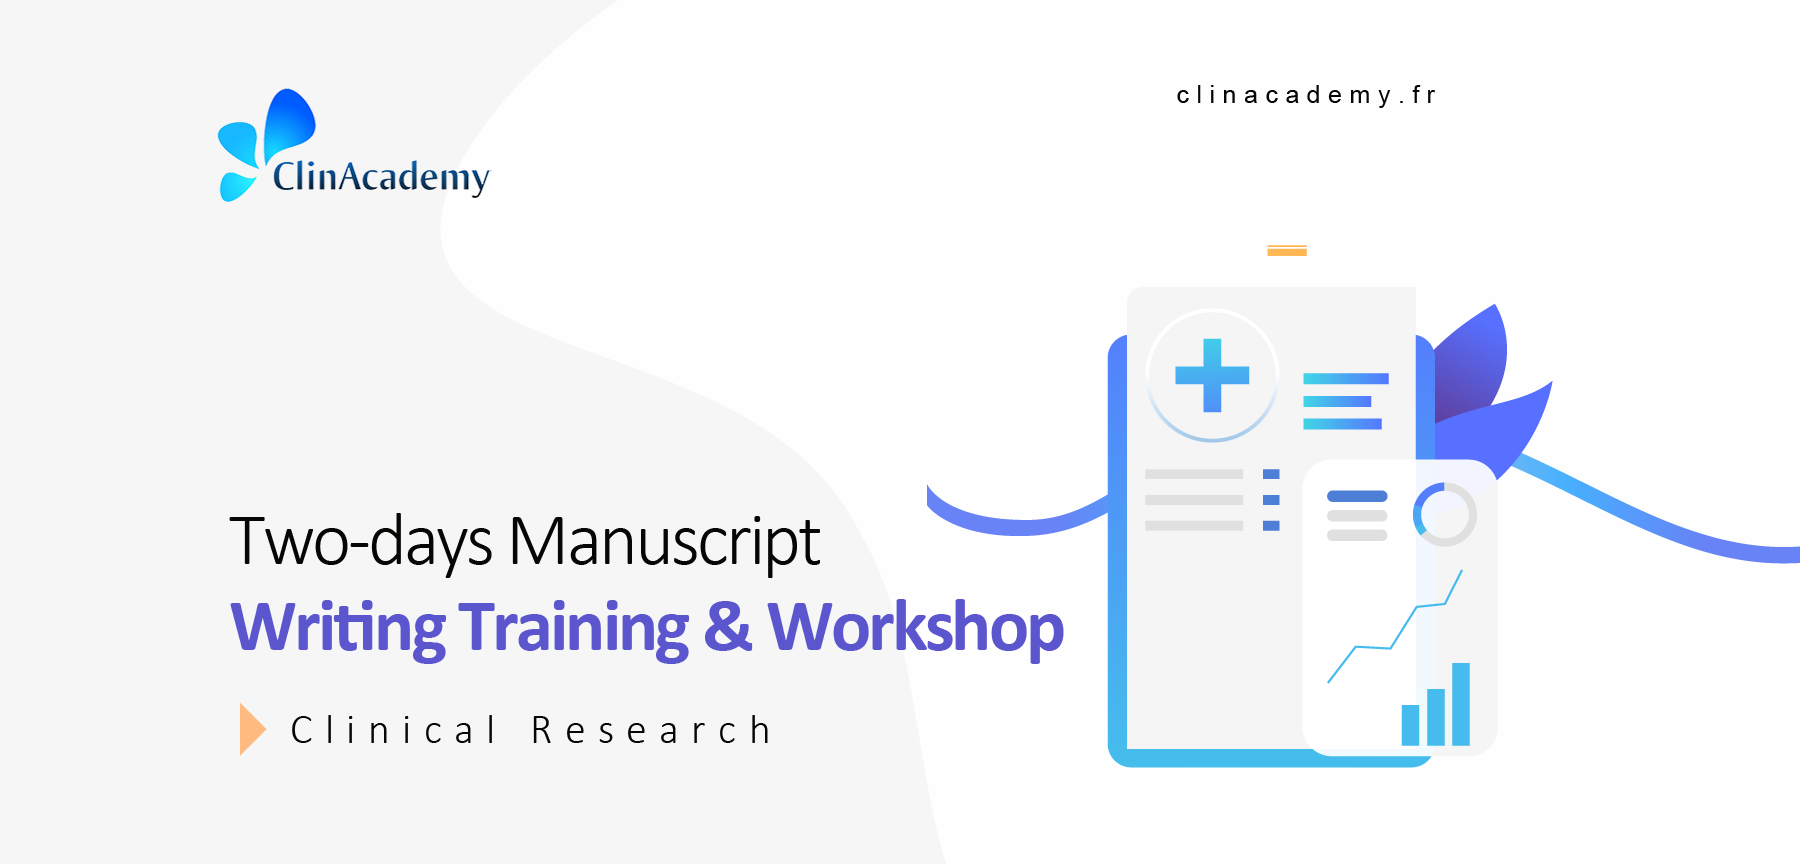 Two days Manuscript Writing Training & Workshop